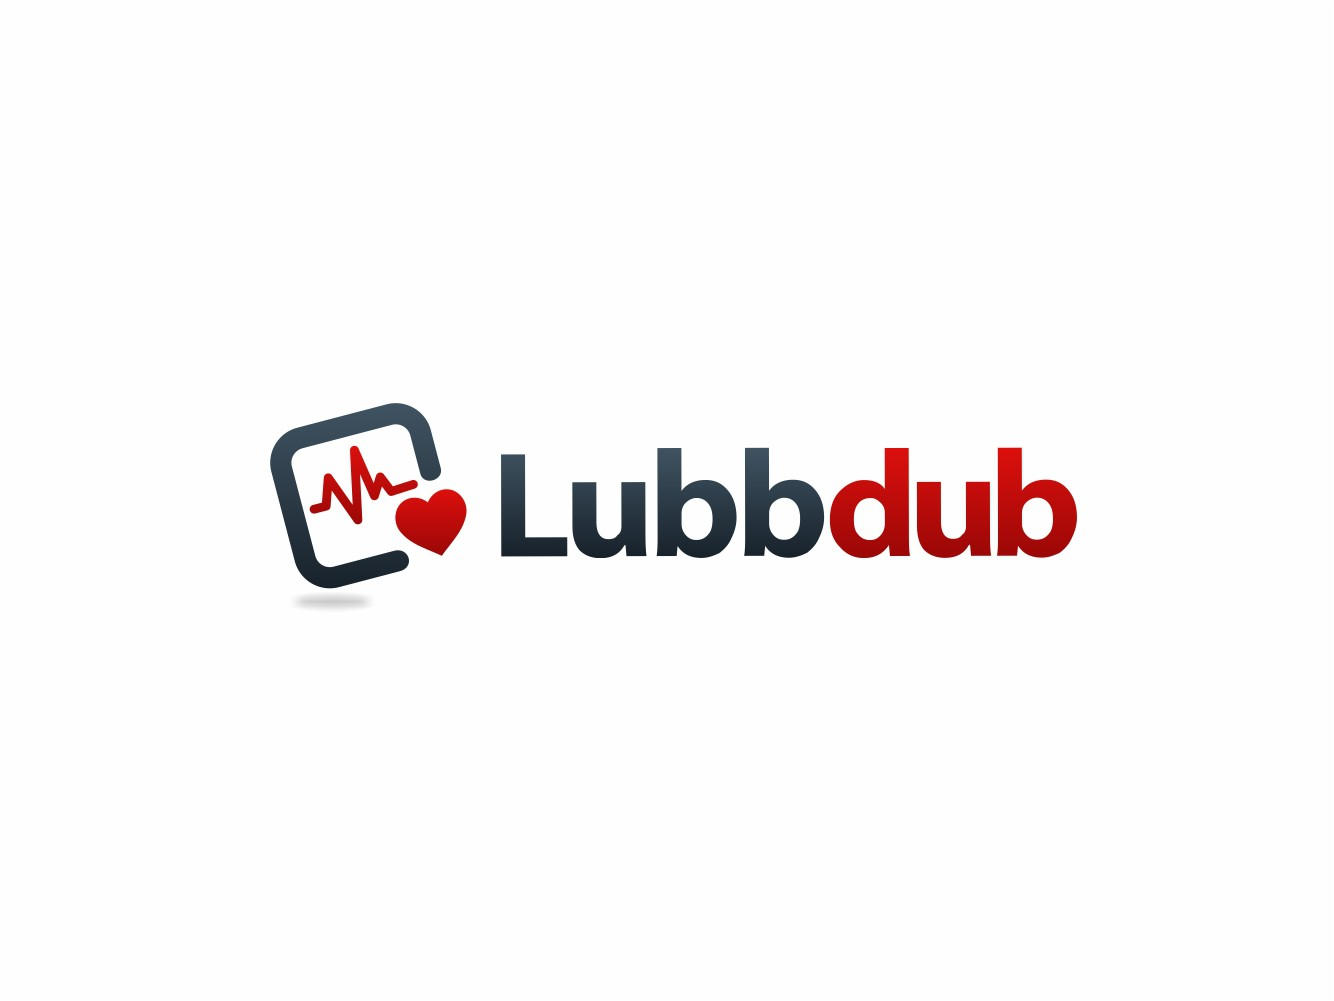 Help Lubbdub with a new logo